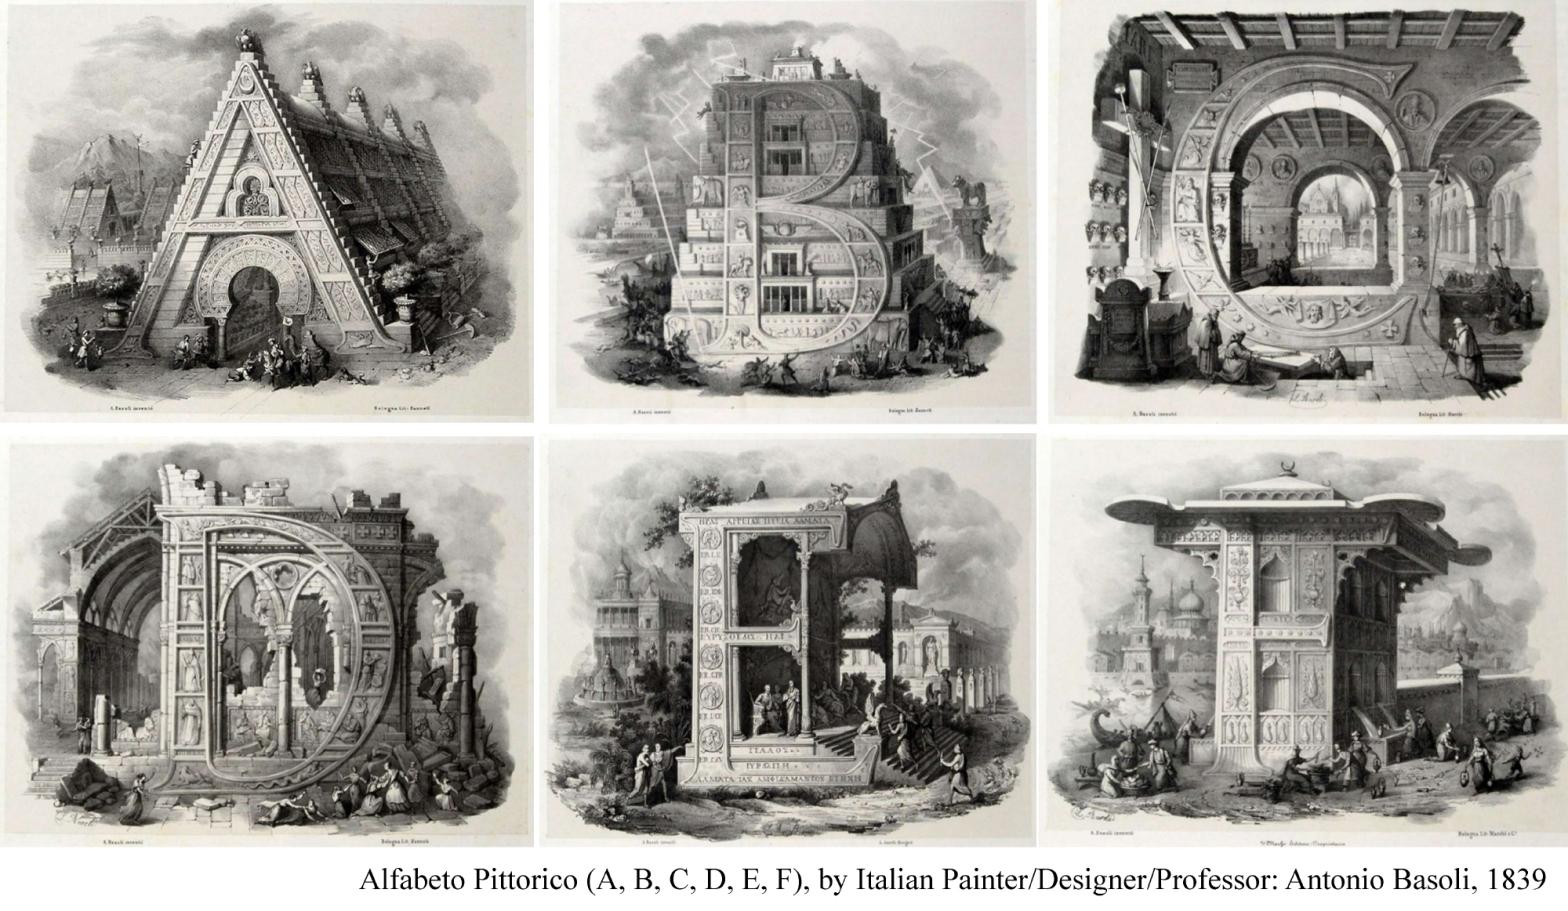 Alfabeto Pittorico: A curious alphabet of splendid architecture